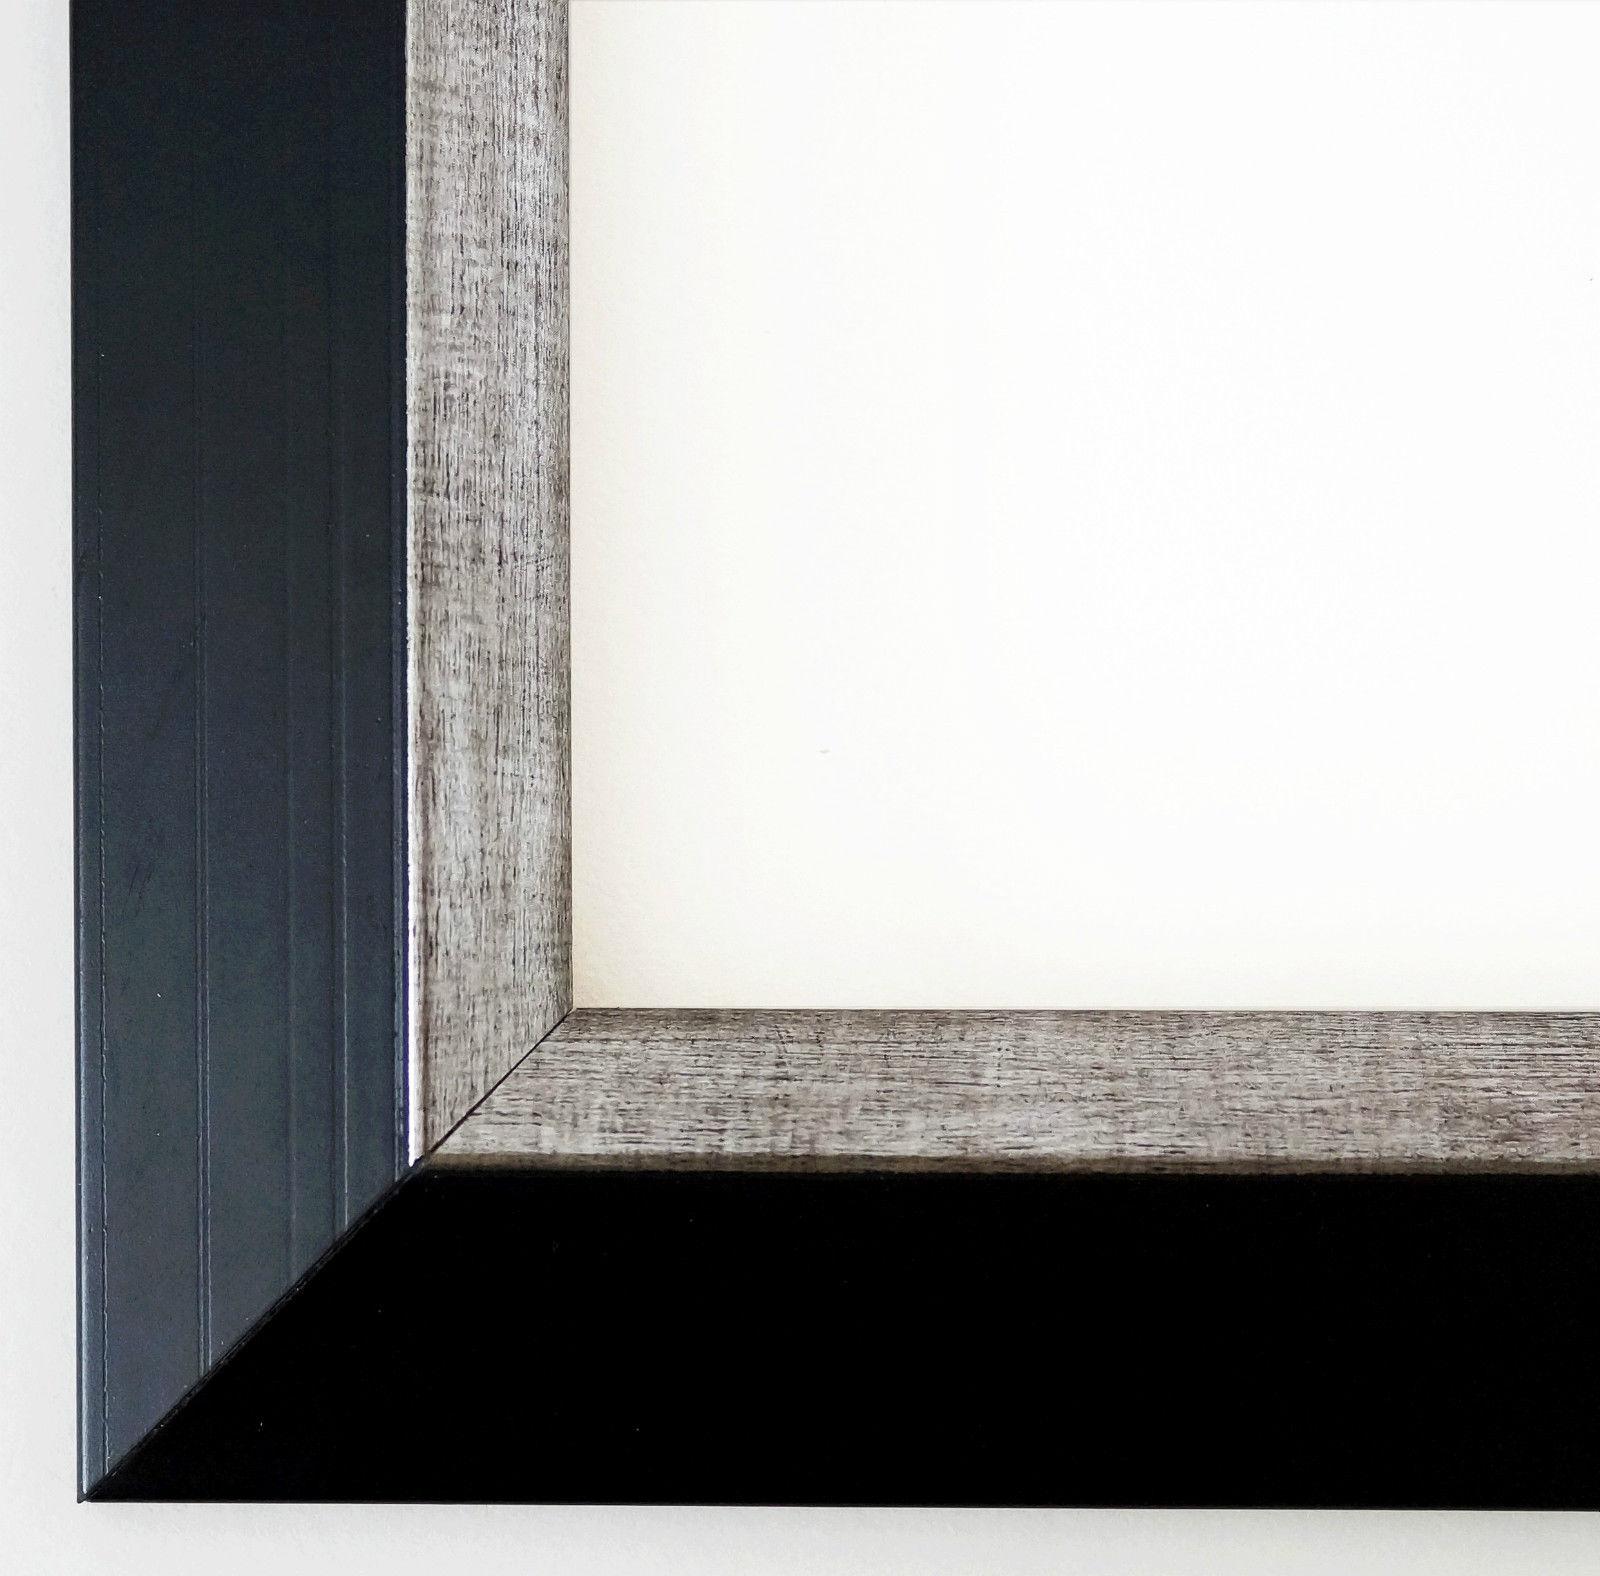 Bilderrahmen Schwarz Silber Modern Art Deco Rahmen Holz Lüneburg 4 ...